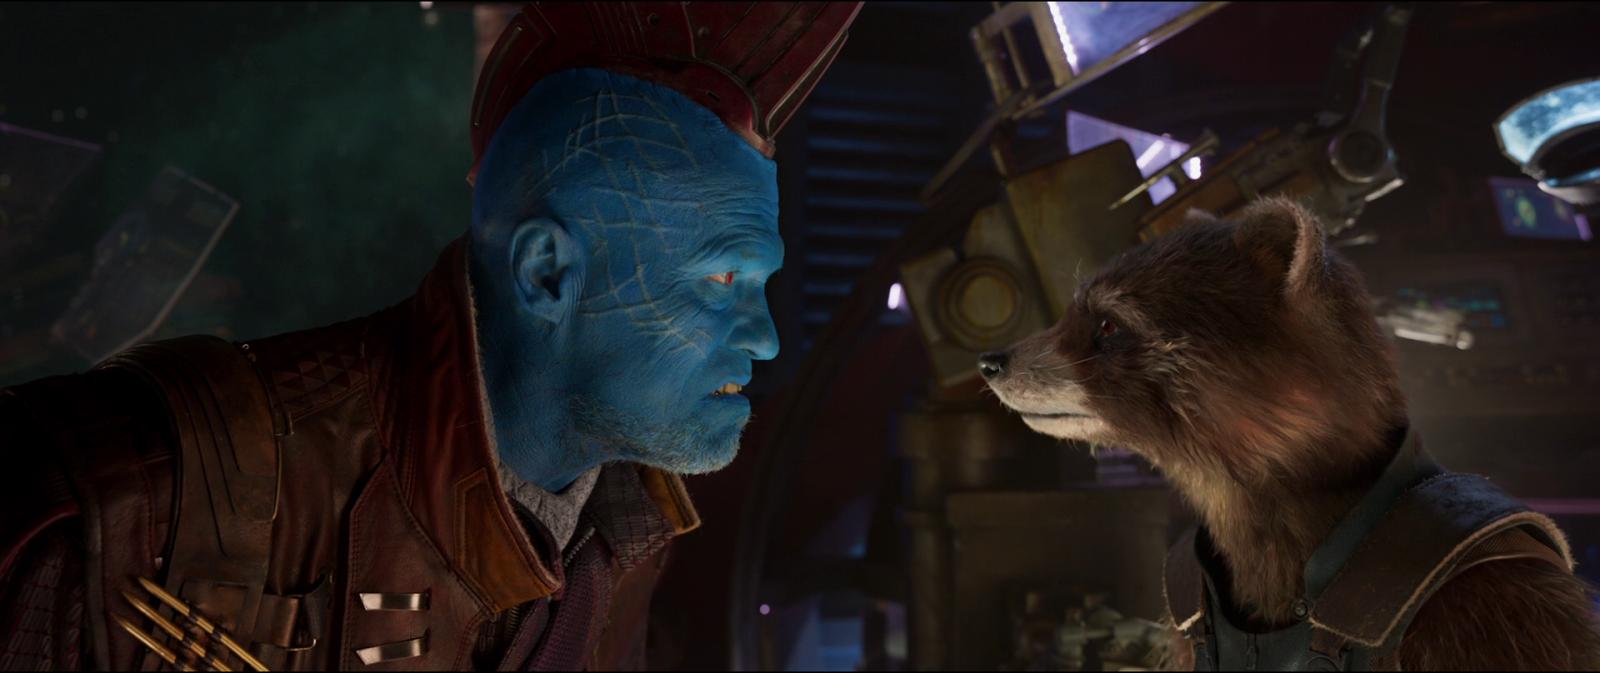 Guardianes de la galaxia Vol. 2 (2017) HD 1080p Latino - Ingles captura 1